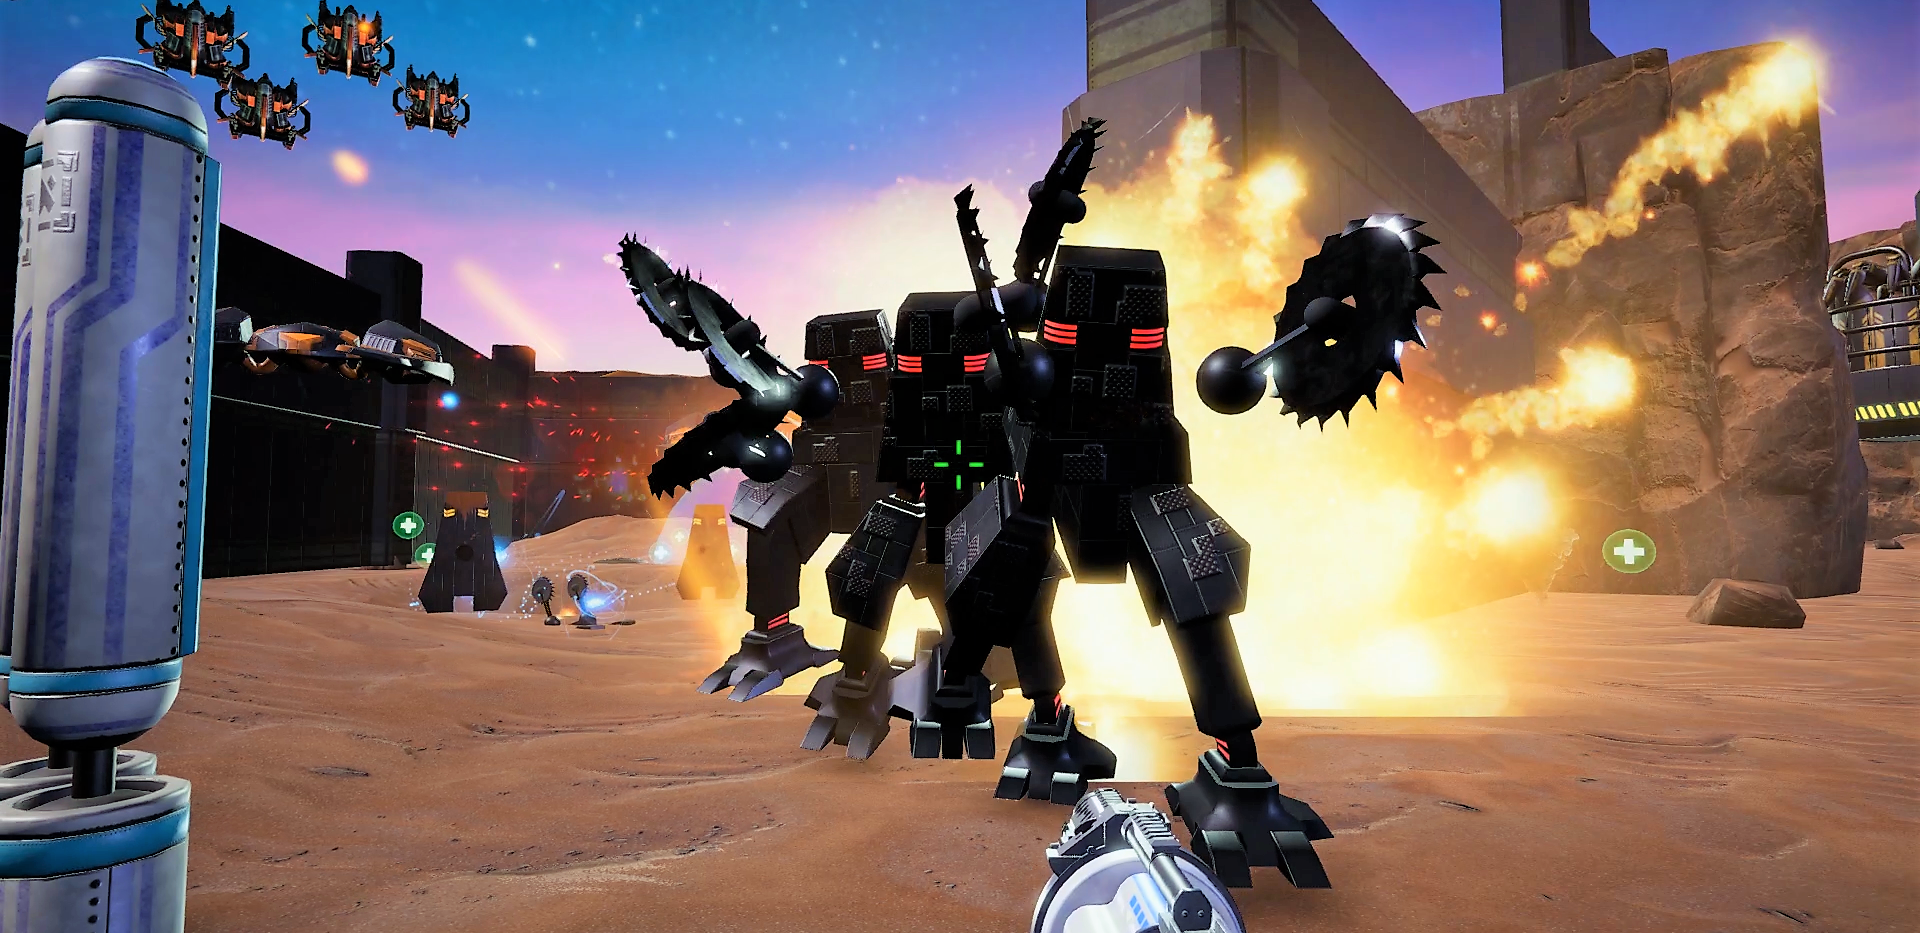 Megedo Attack - PC